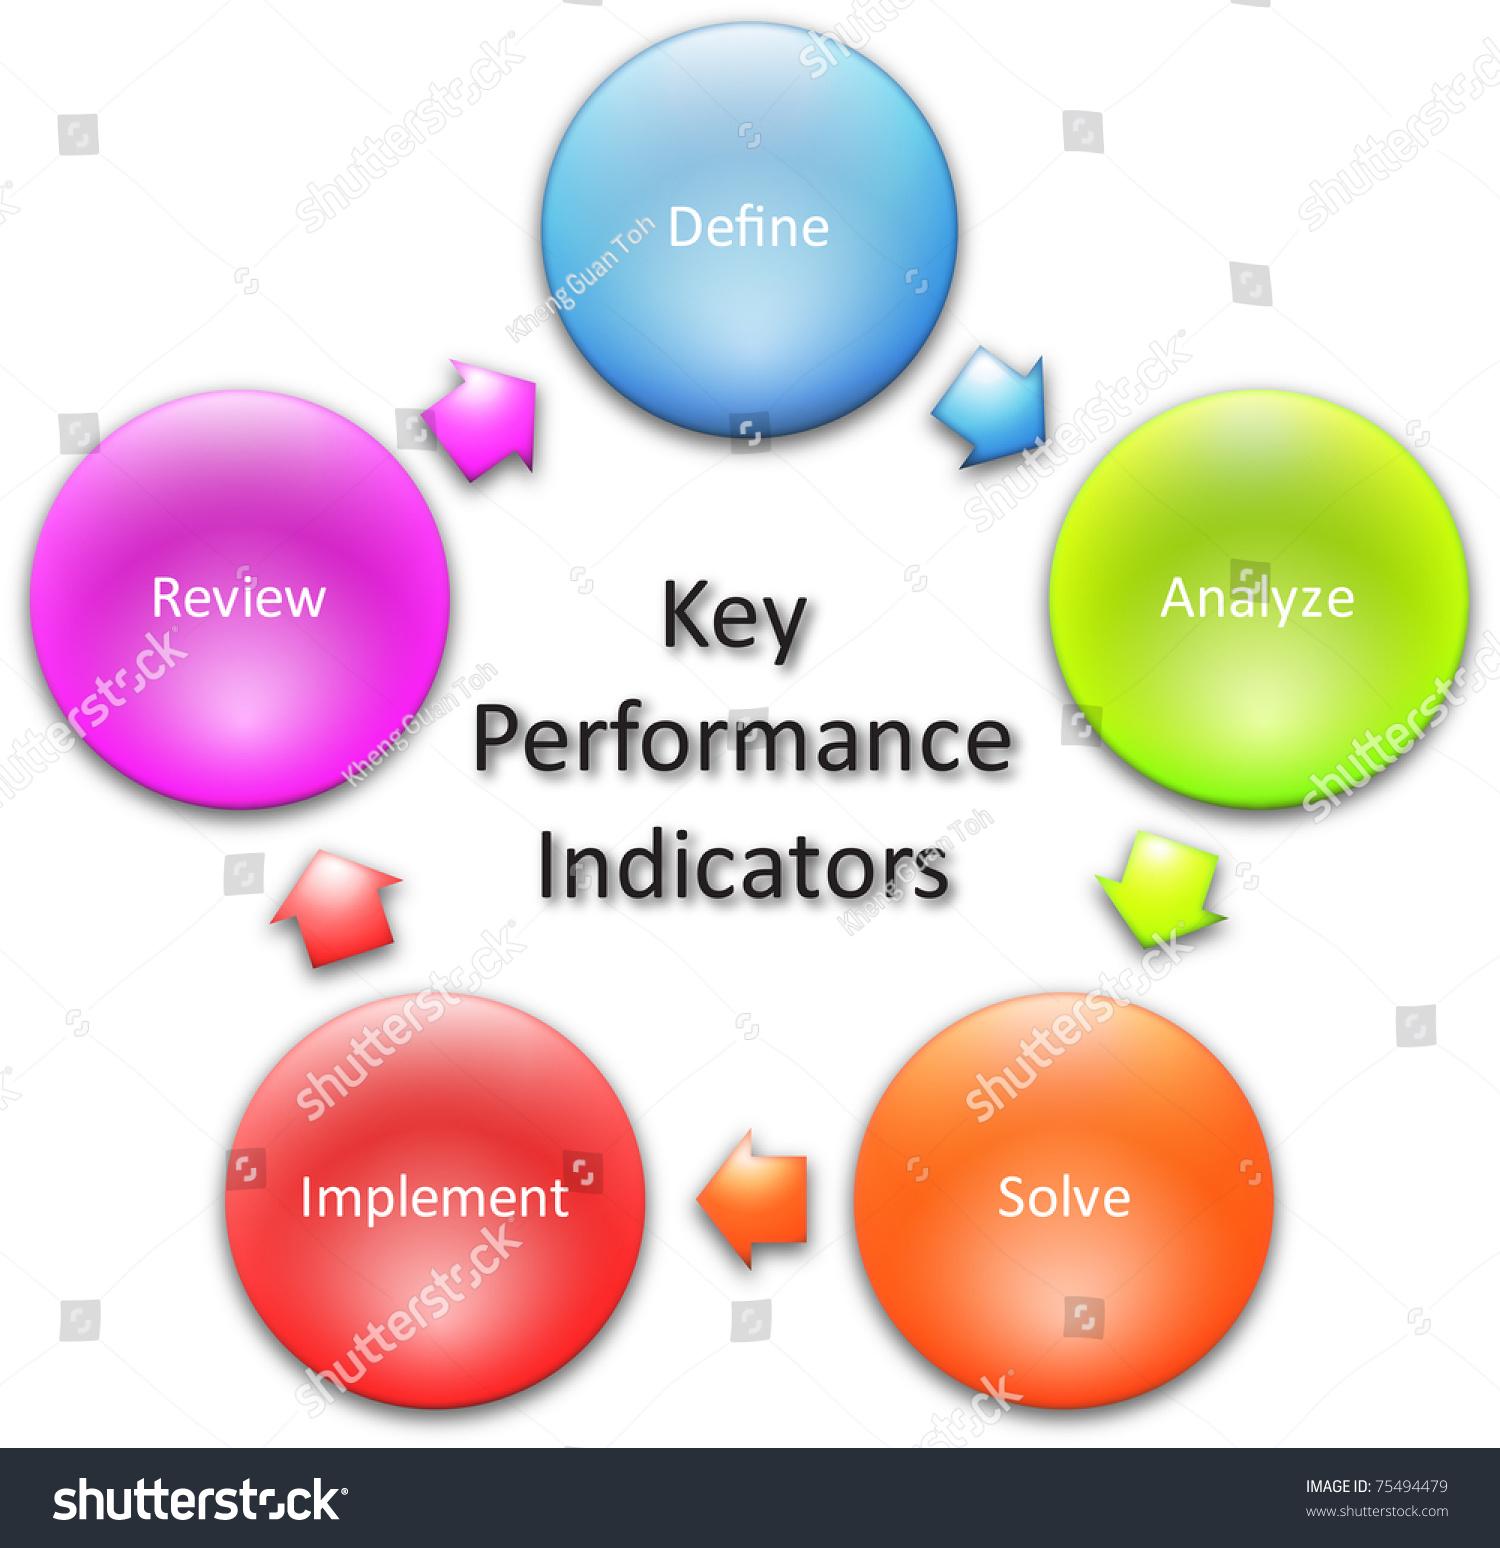 key performance indicators business diagram managementのイラスト素材